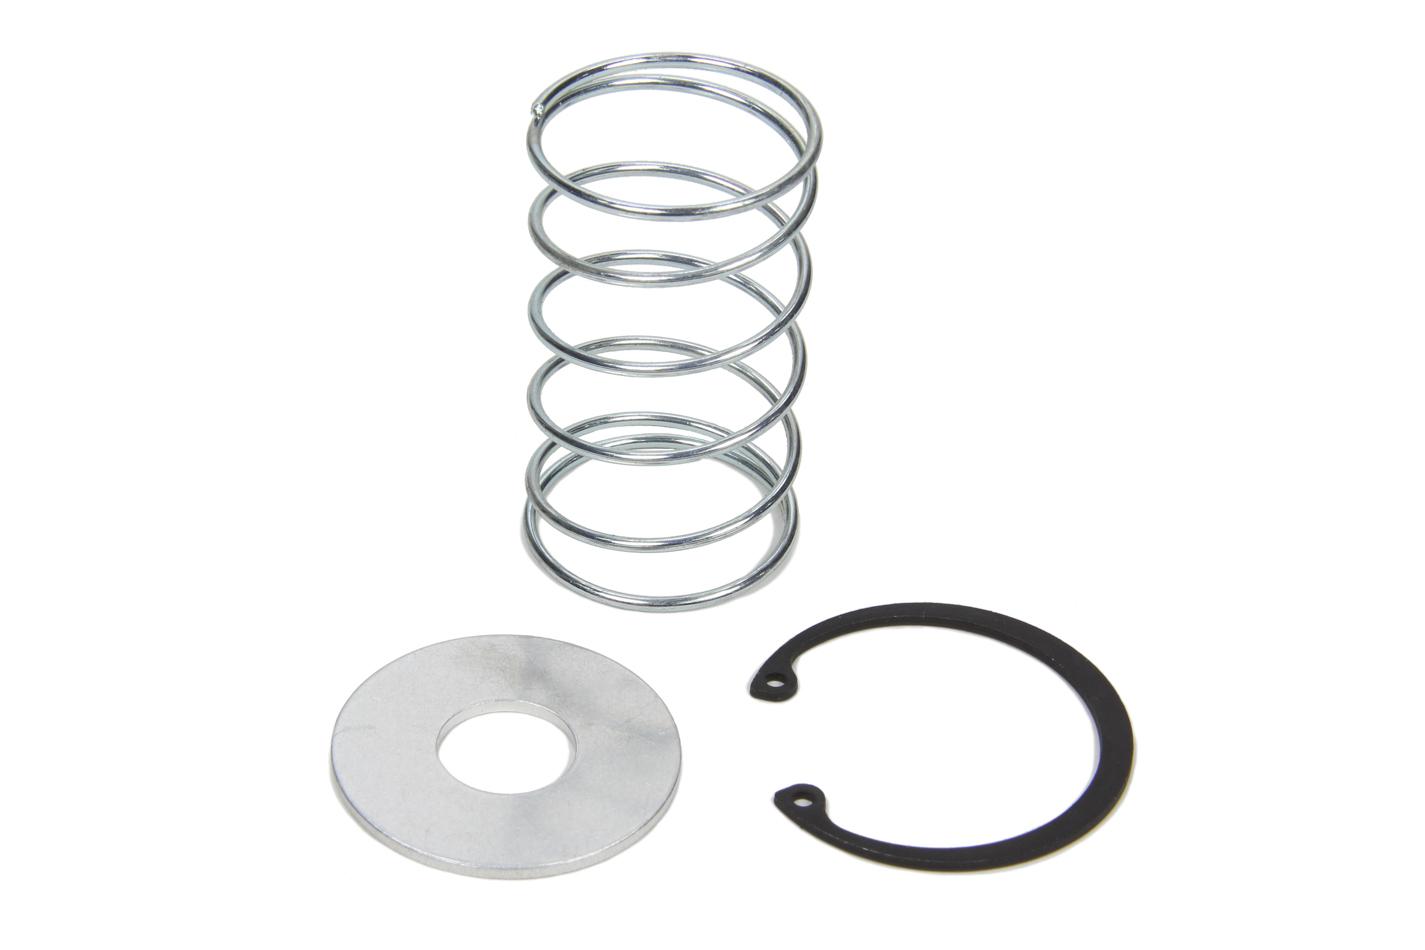 Ti22 Performance Washer/Retaining Ring /Spring for 4732